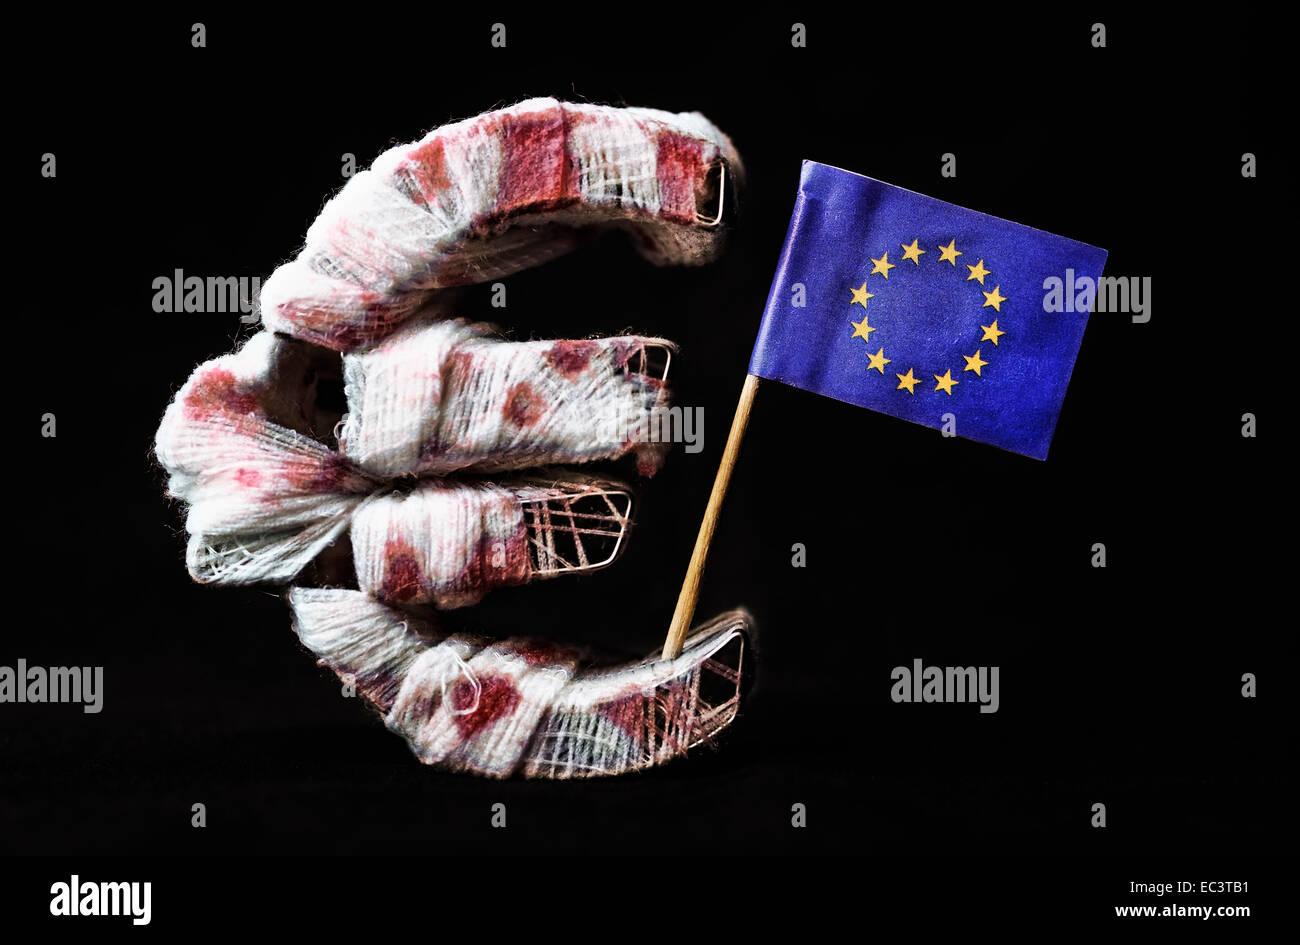 Bloody euro sign and EU banner, debt crisis - Stock Image